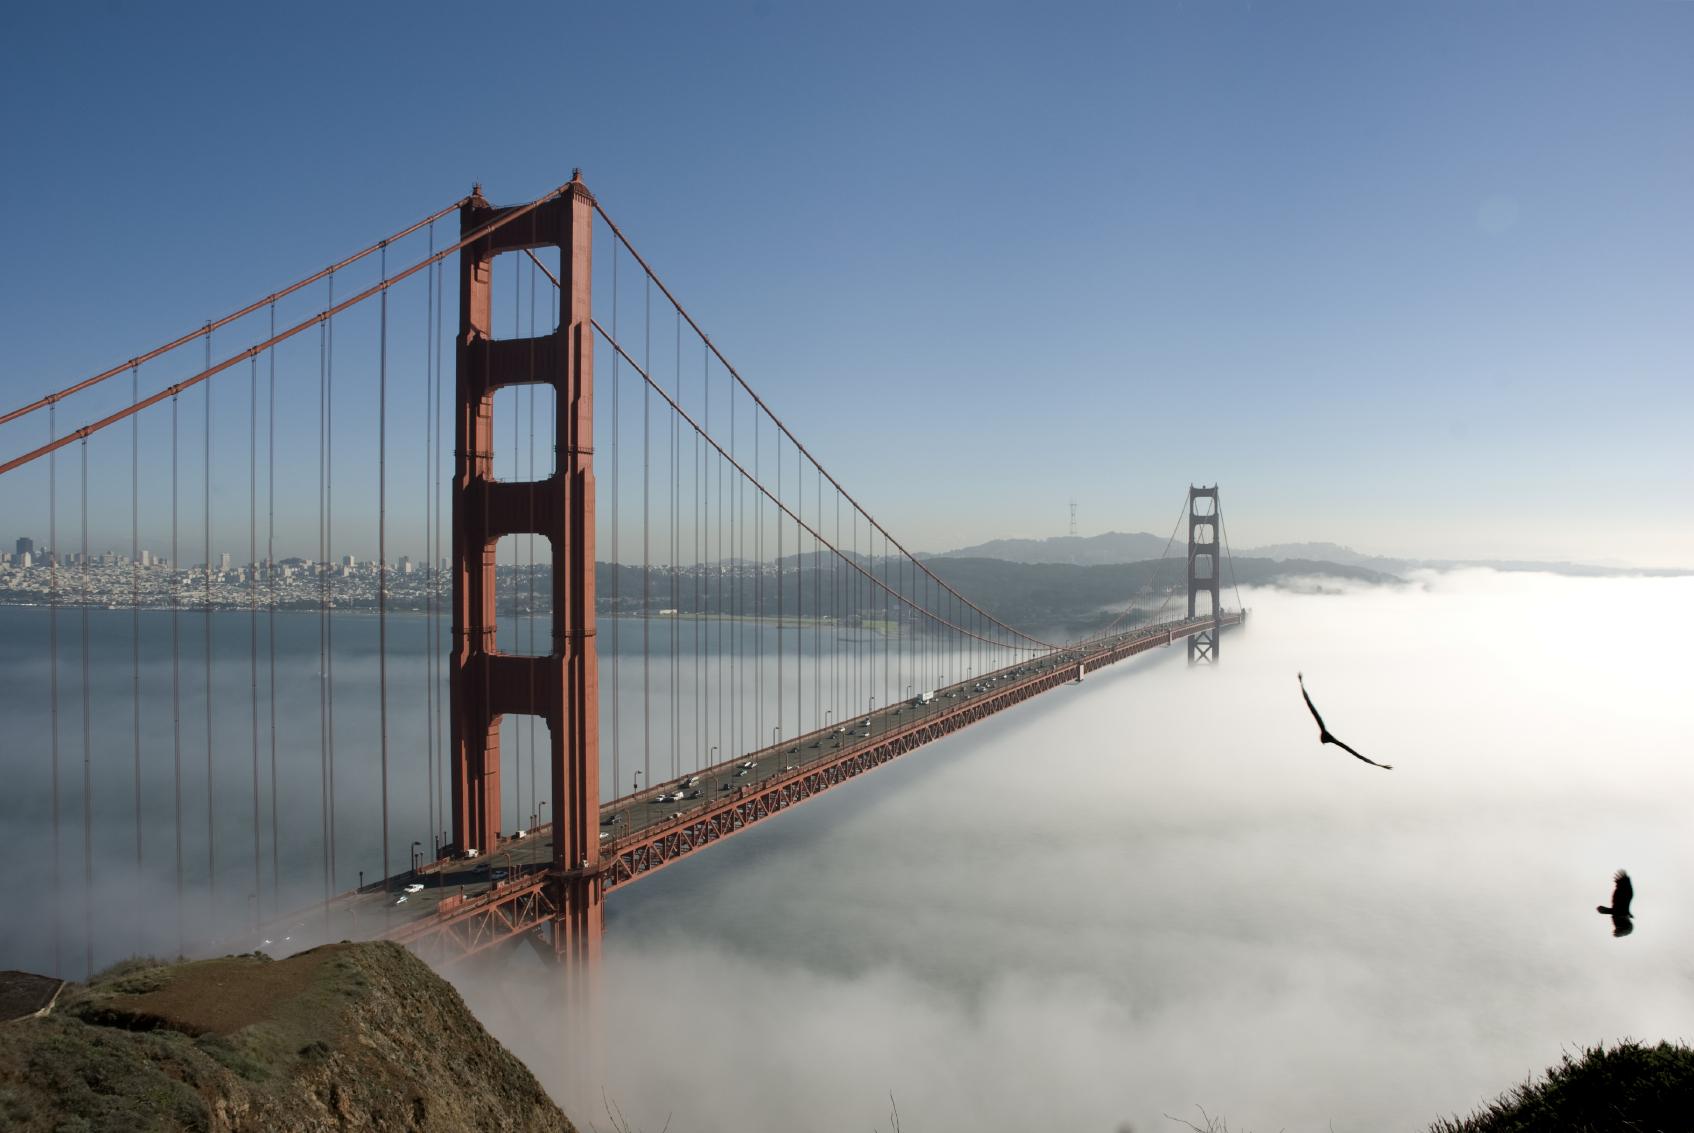 Megastructures - Golden Gate Bridge / Мегаструктури - мостът Голдън гейт